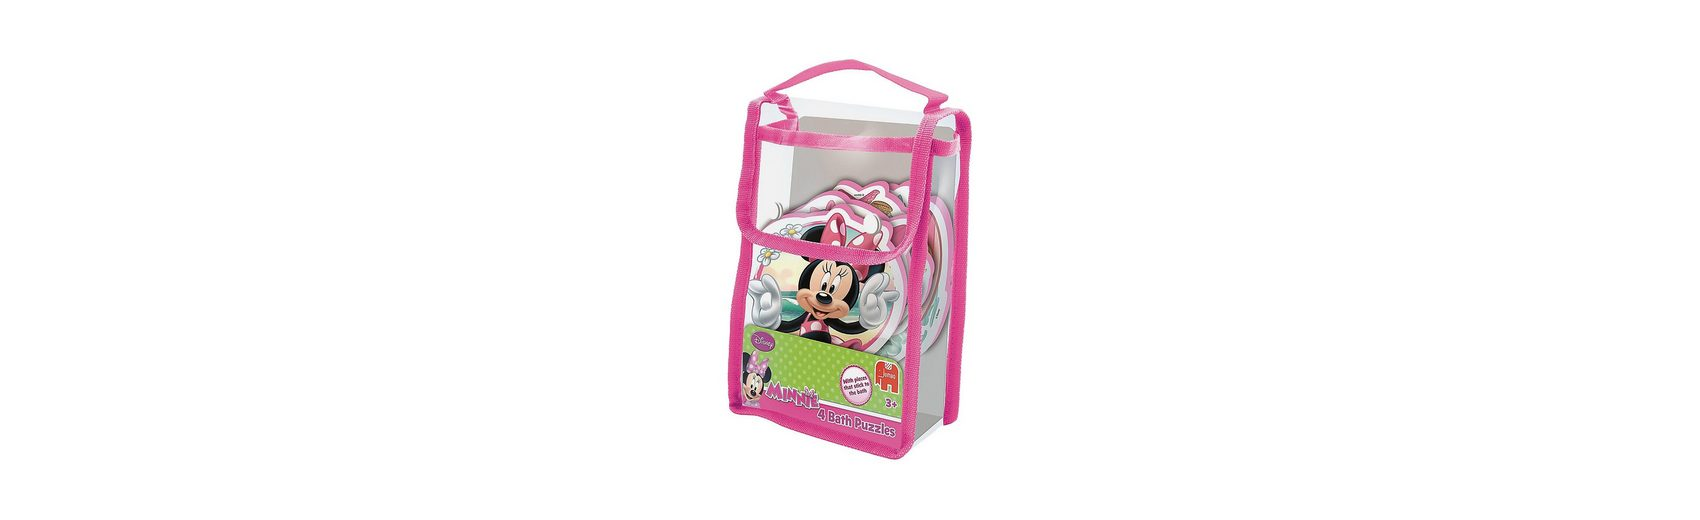 Jumbo Disney Badepuzzle - Minnie Mouse